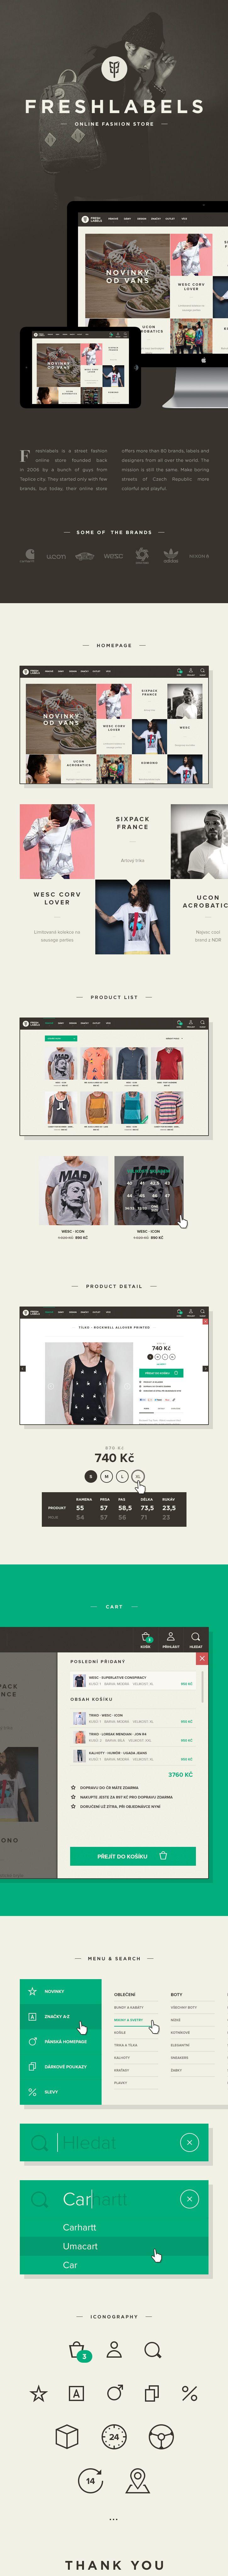 Fresh Labels | Interactive Design